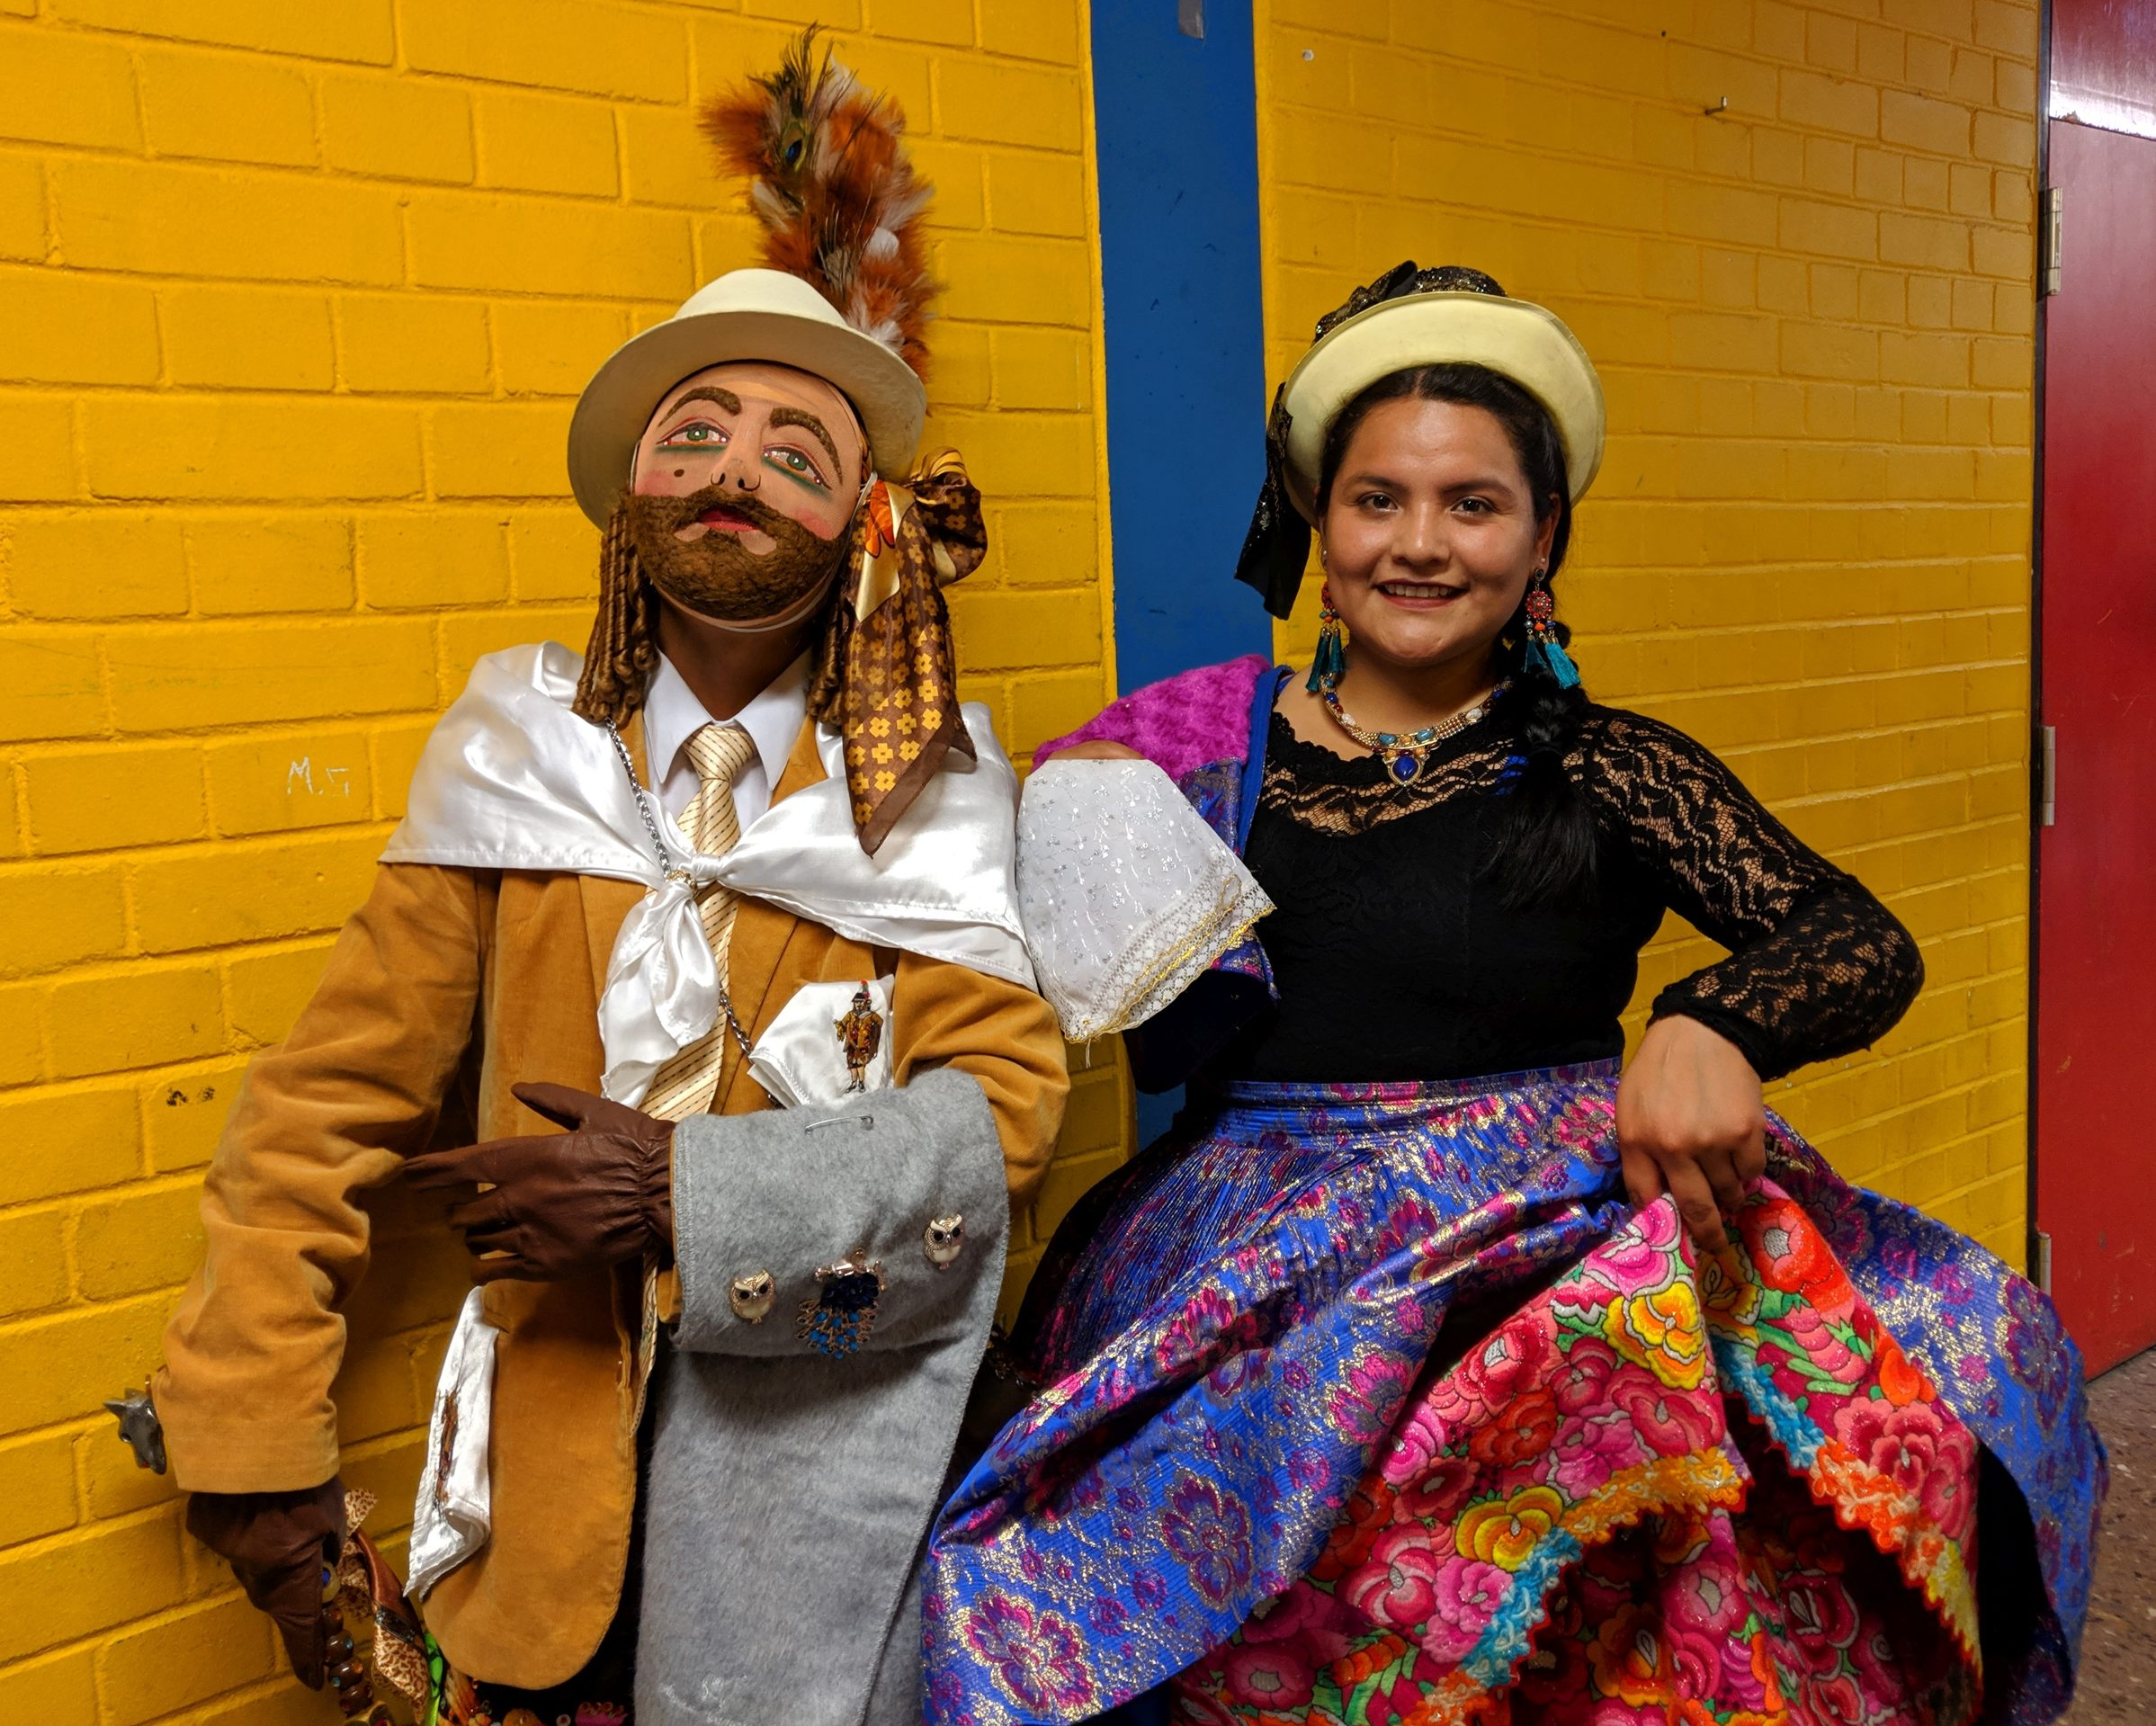 Tanz-Kostüme aus Huancayo